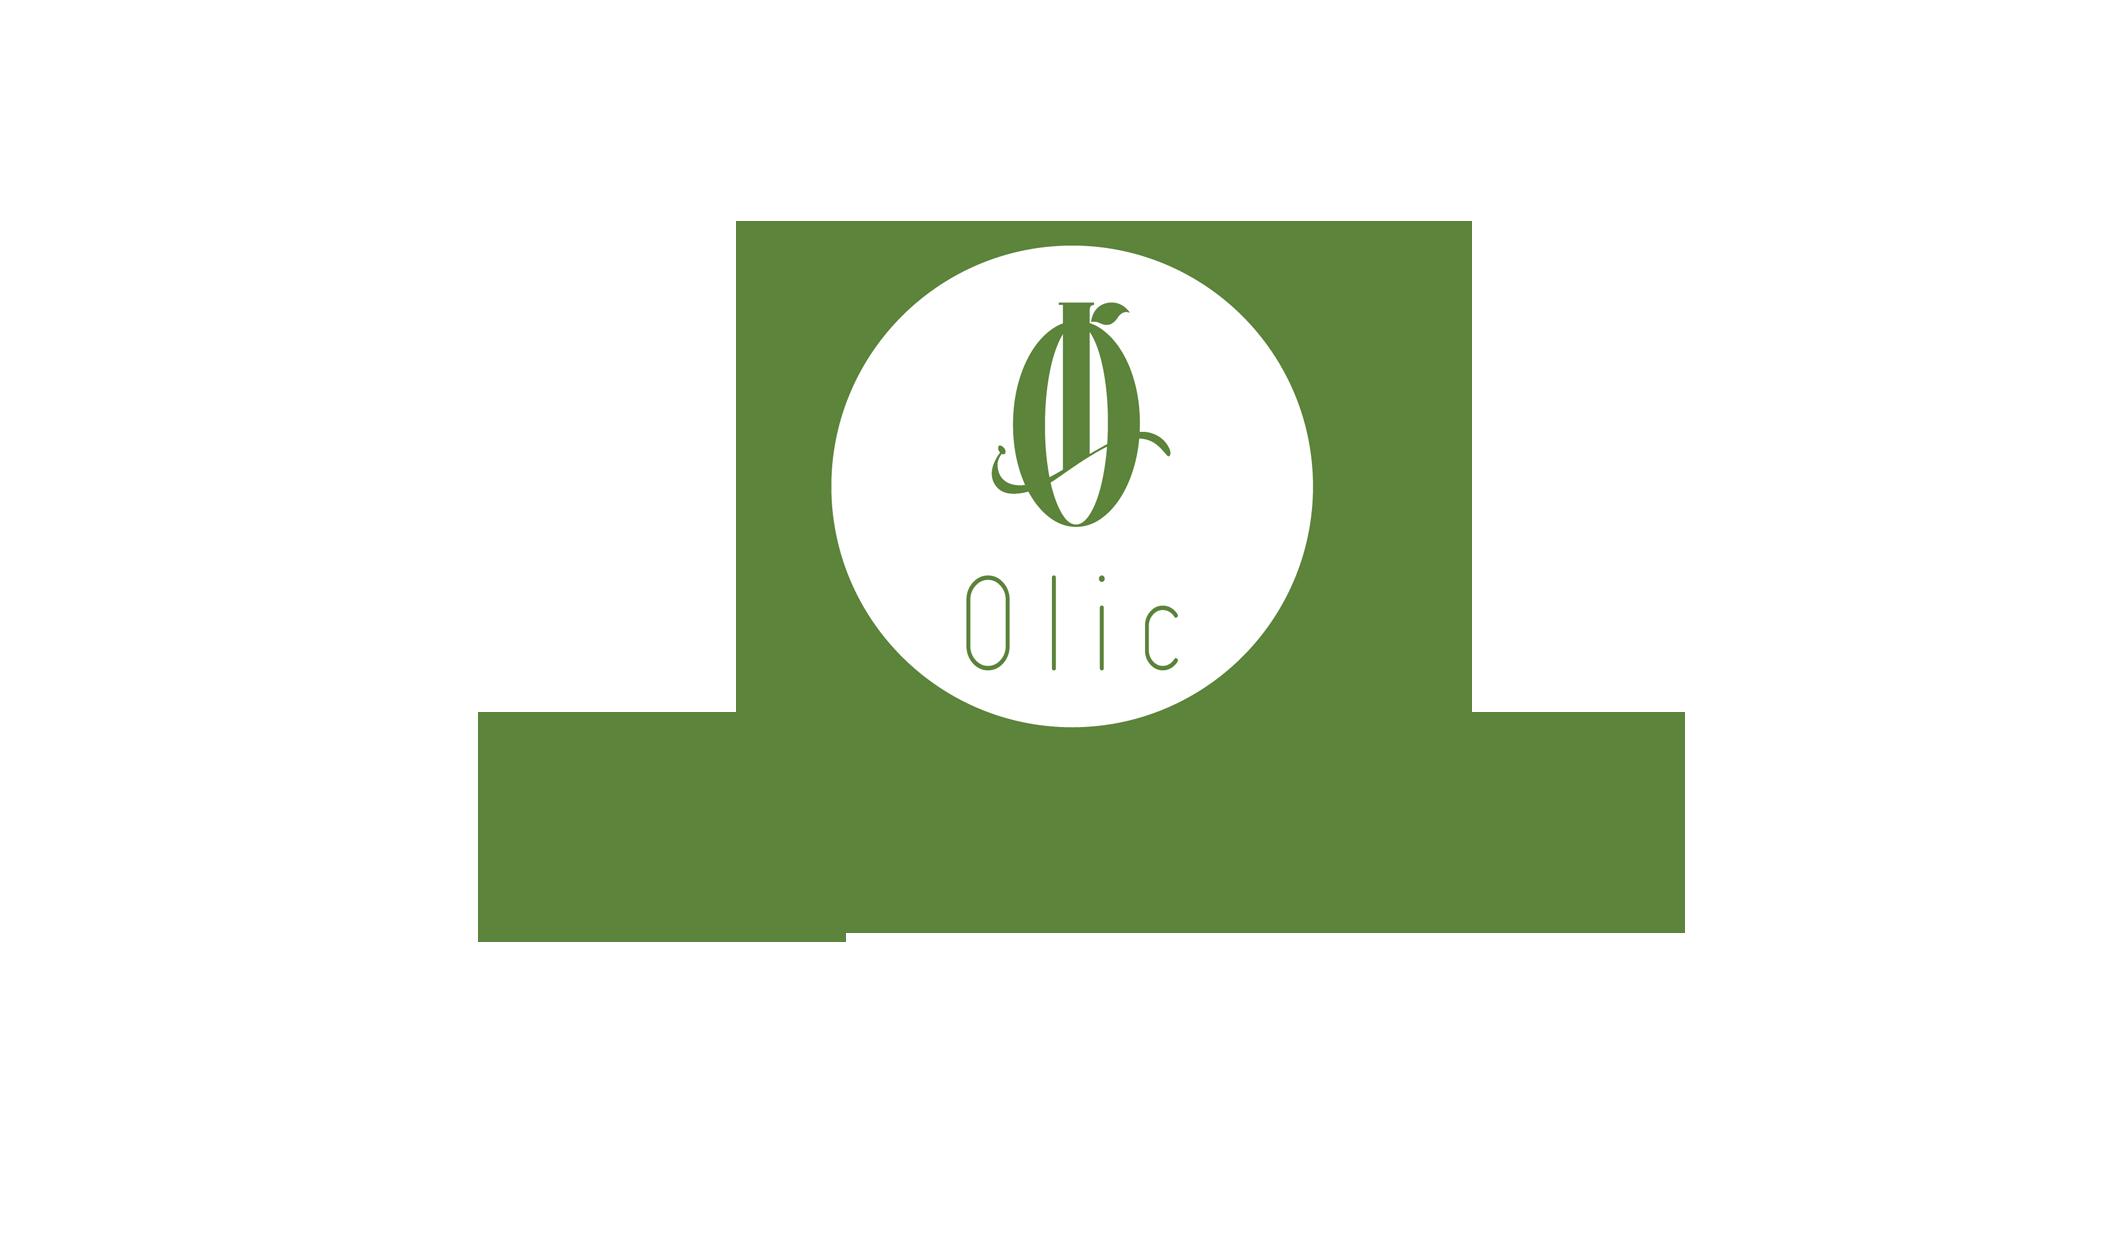 Logo olic 2